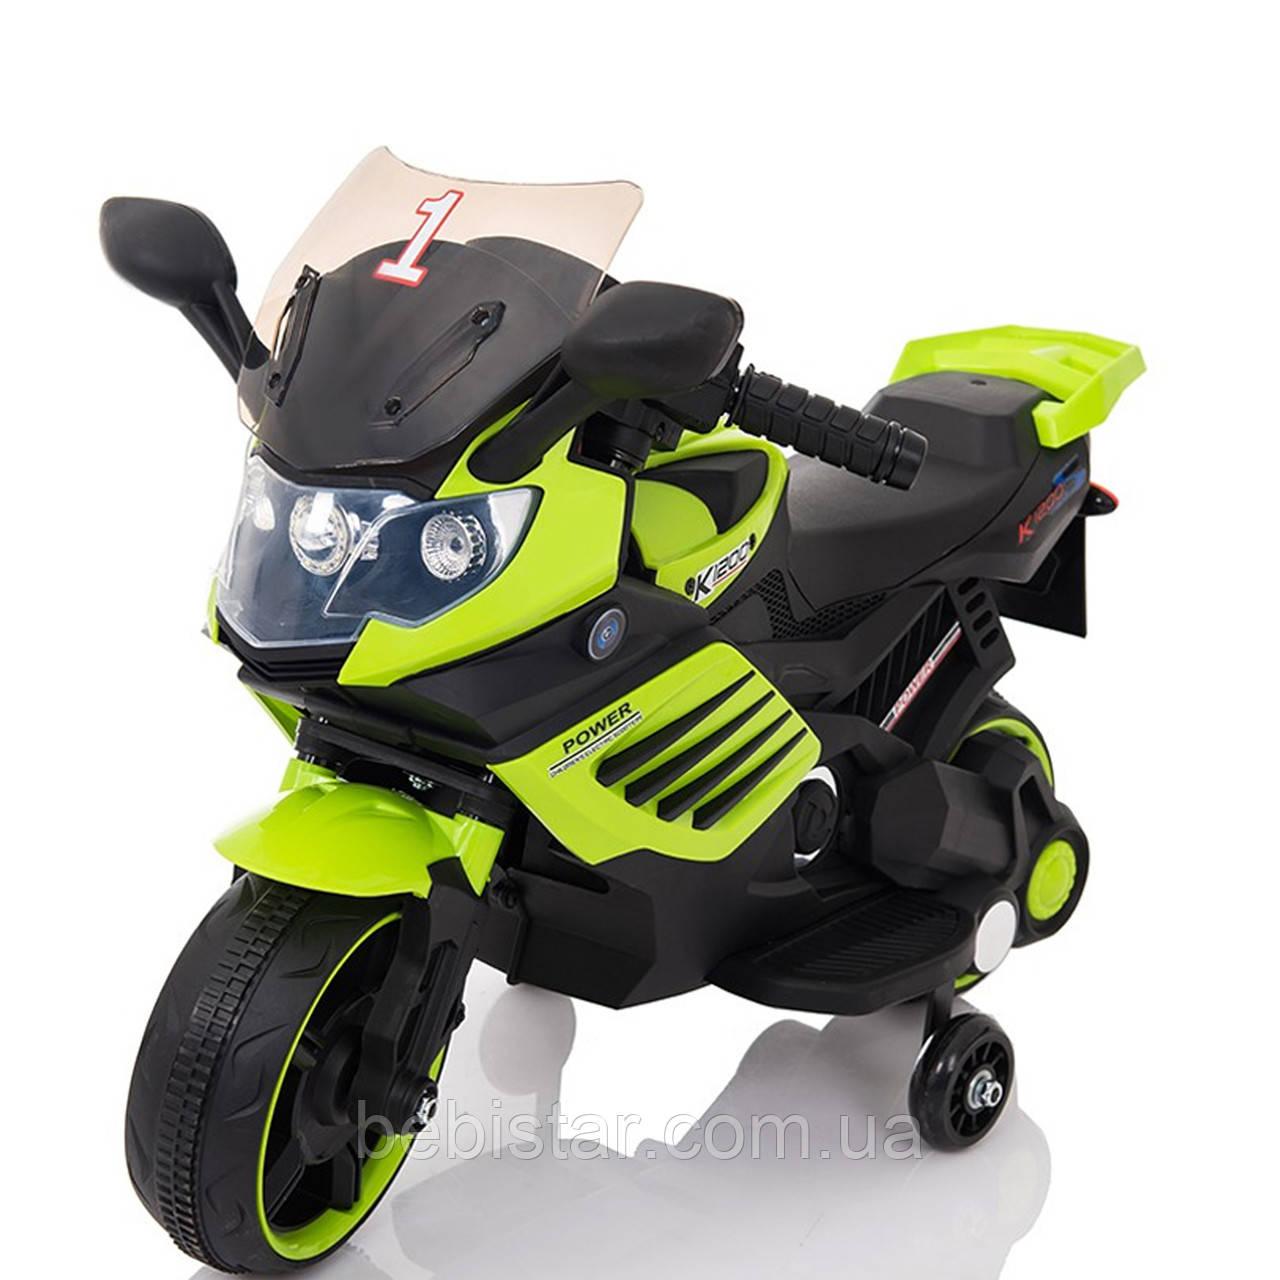 Электромобиль-мотоцикл зеленый Т-7210 EVA GREEN мотор 1*15W аккумулятор 6V4,5AH деткам 2-4 года, рост до 105см